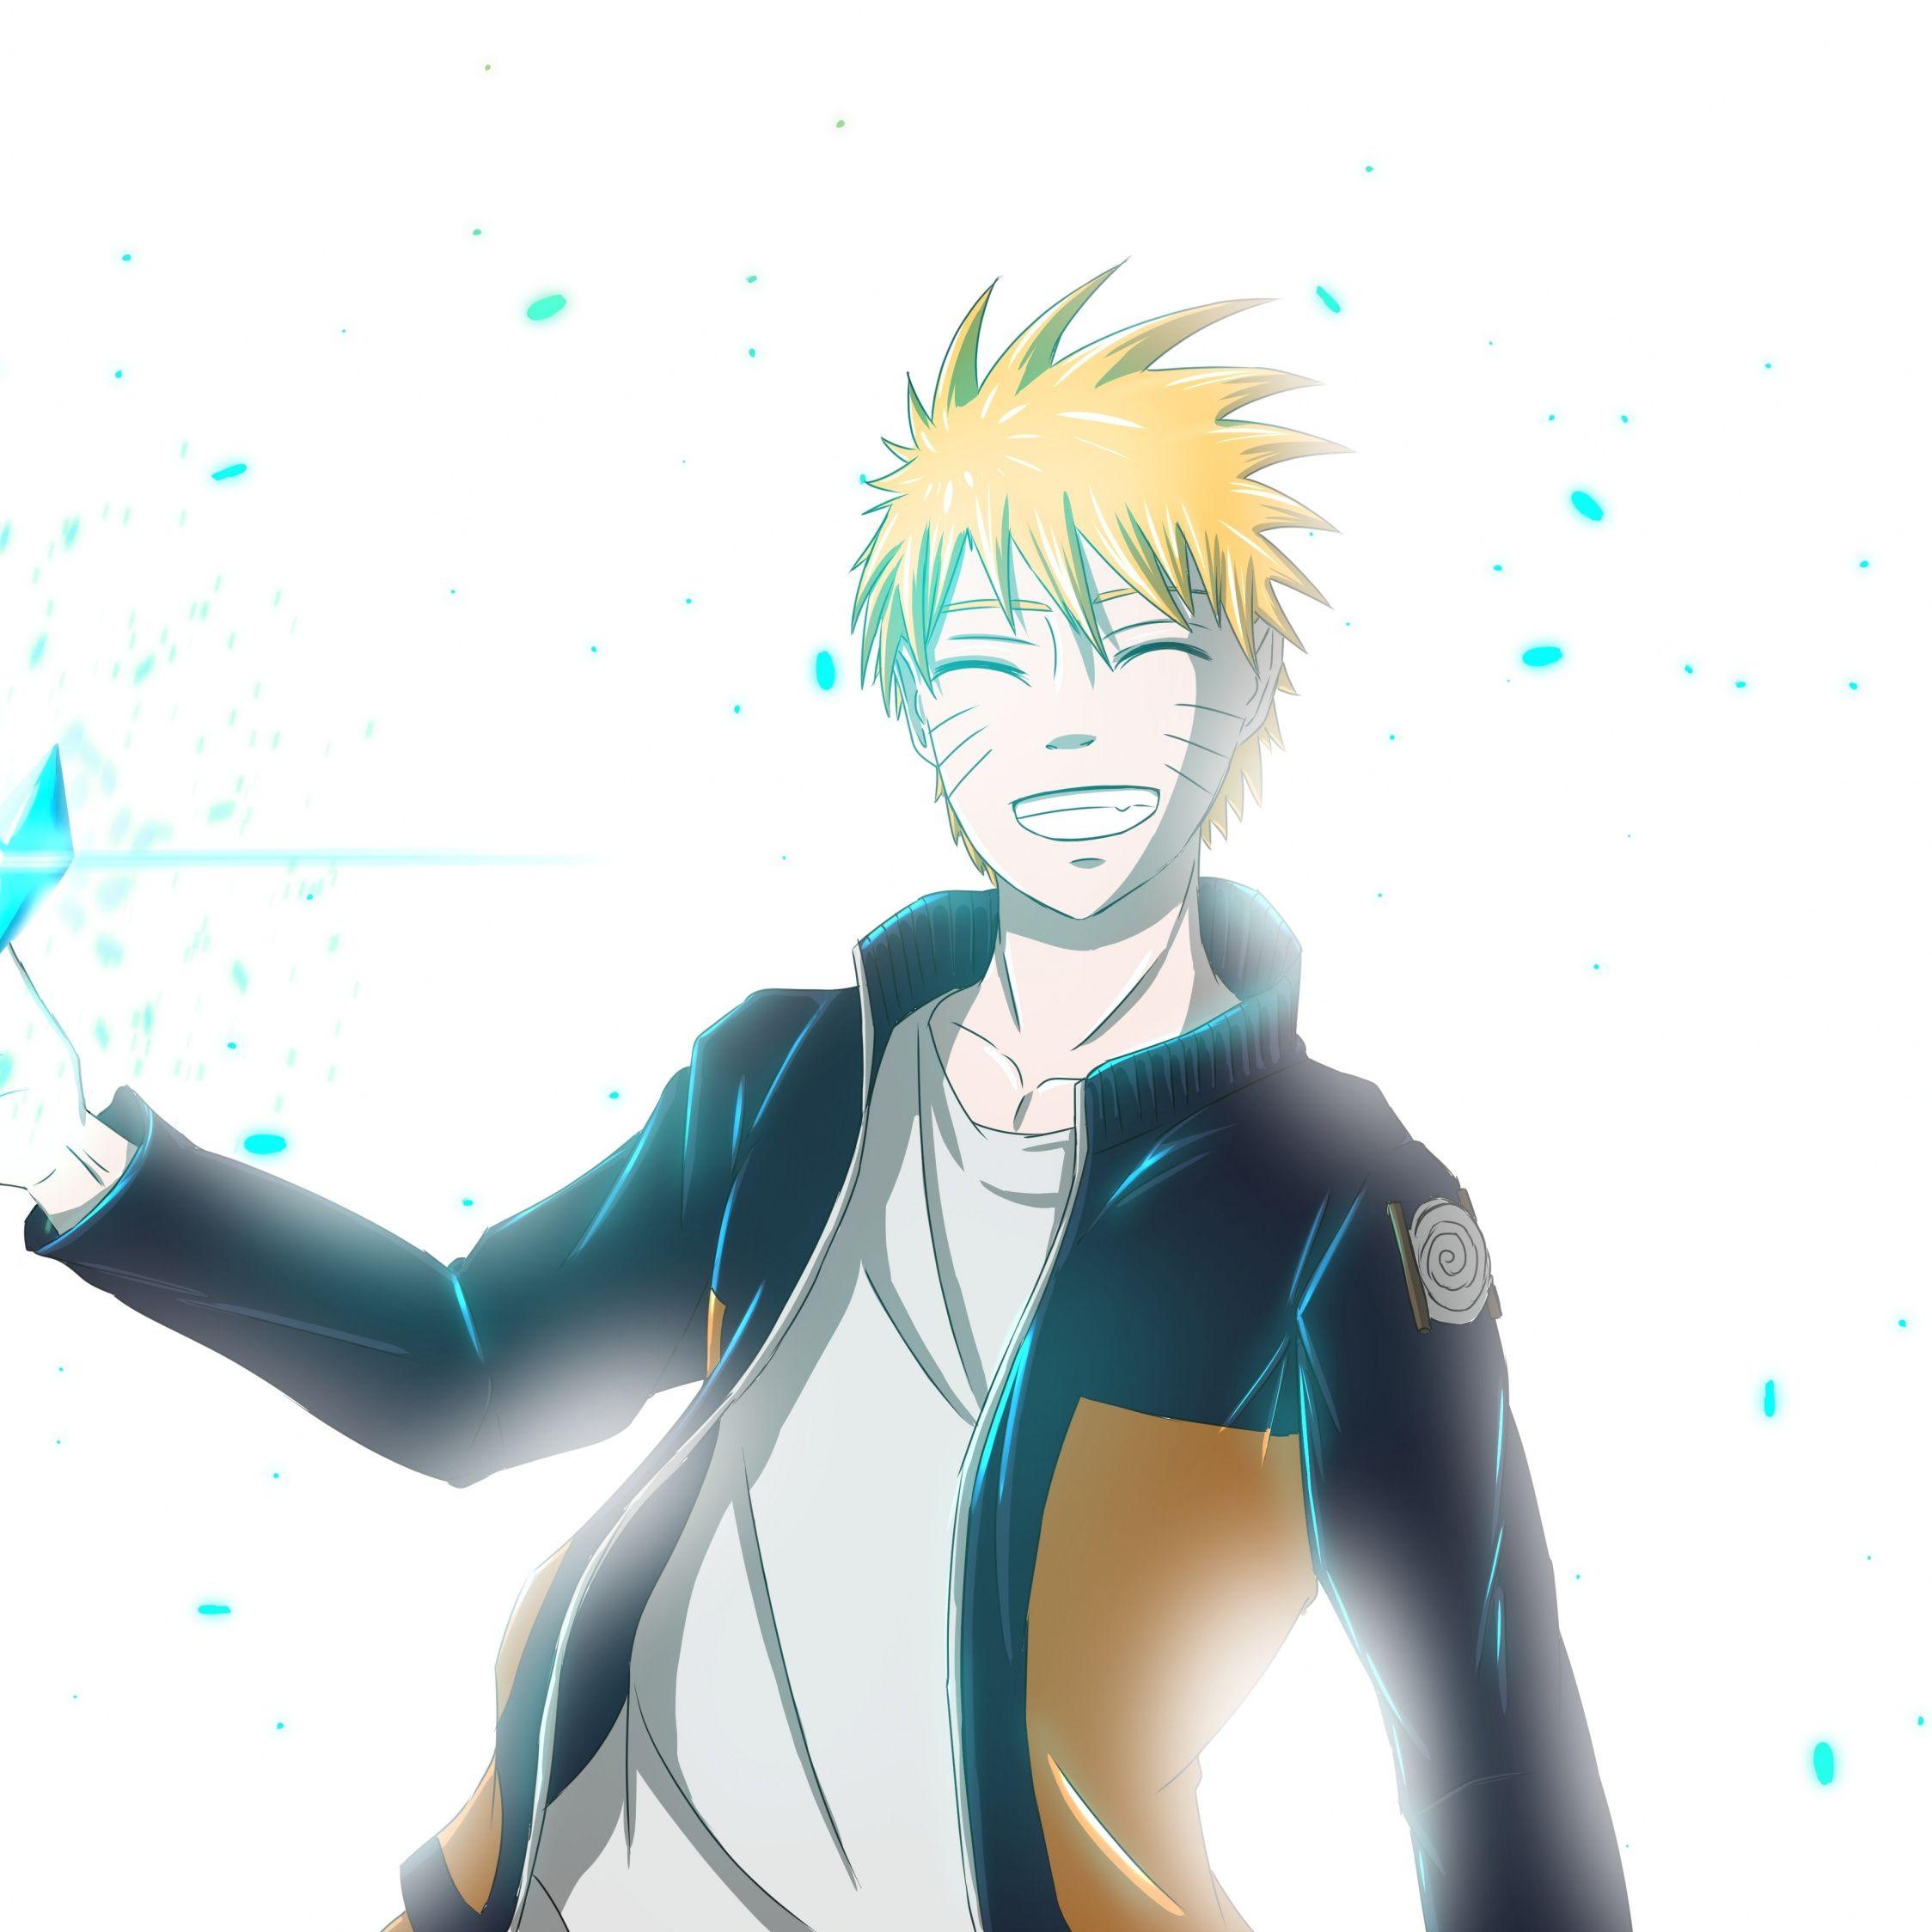 Naruto Uzumaki Anime Boy Happy Art 2248x2248 Wallpaper Anime Happy Art Free Hd Wallpapers